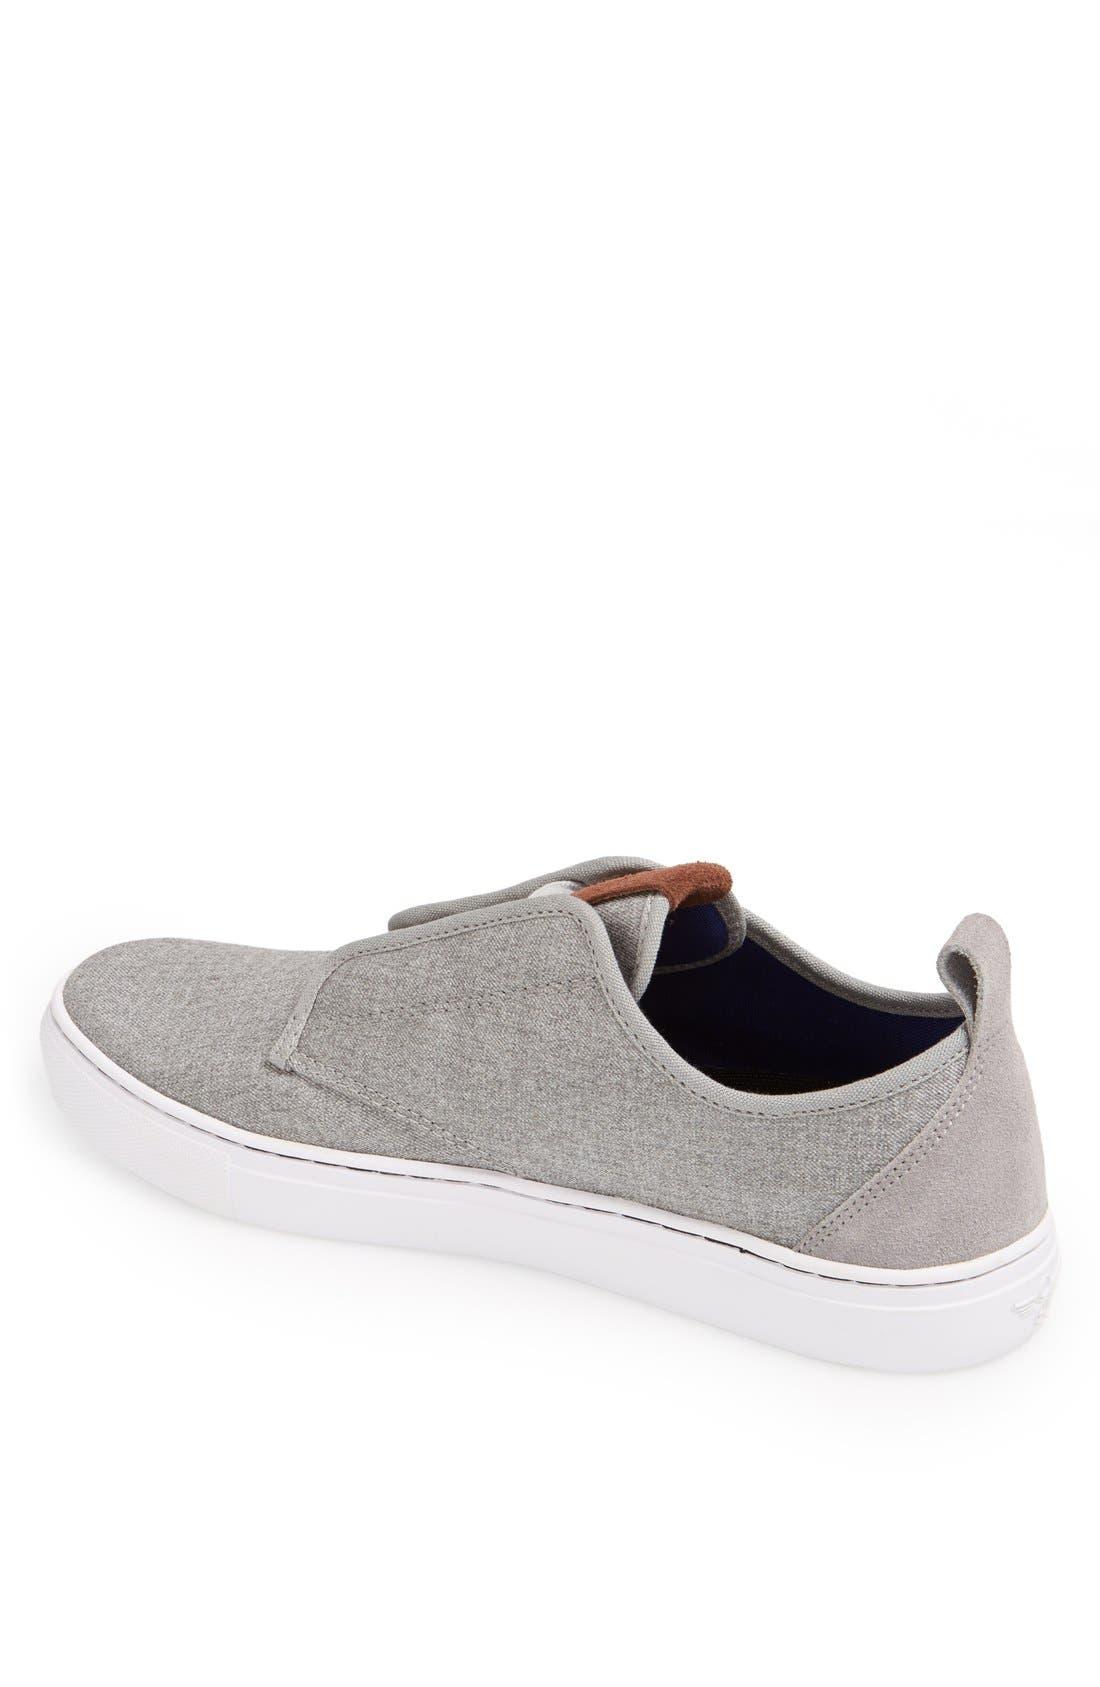 Alternate Image 2  - Creative Recreation 'Lacava' Sneaker (Men)